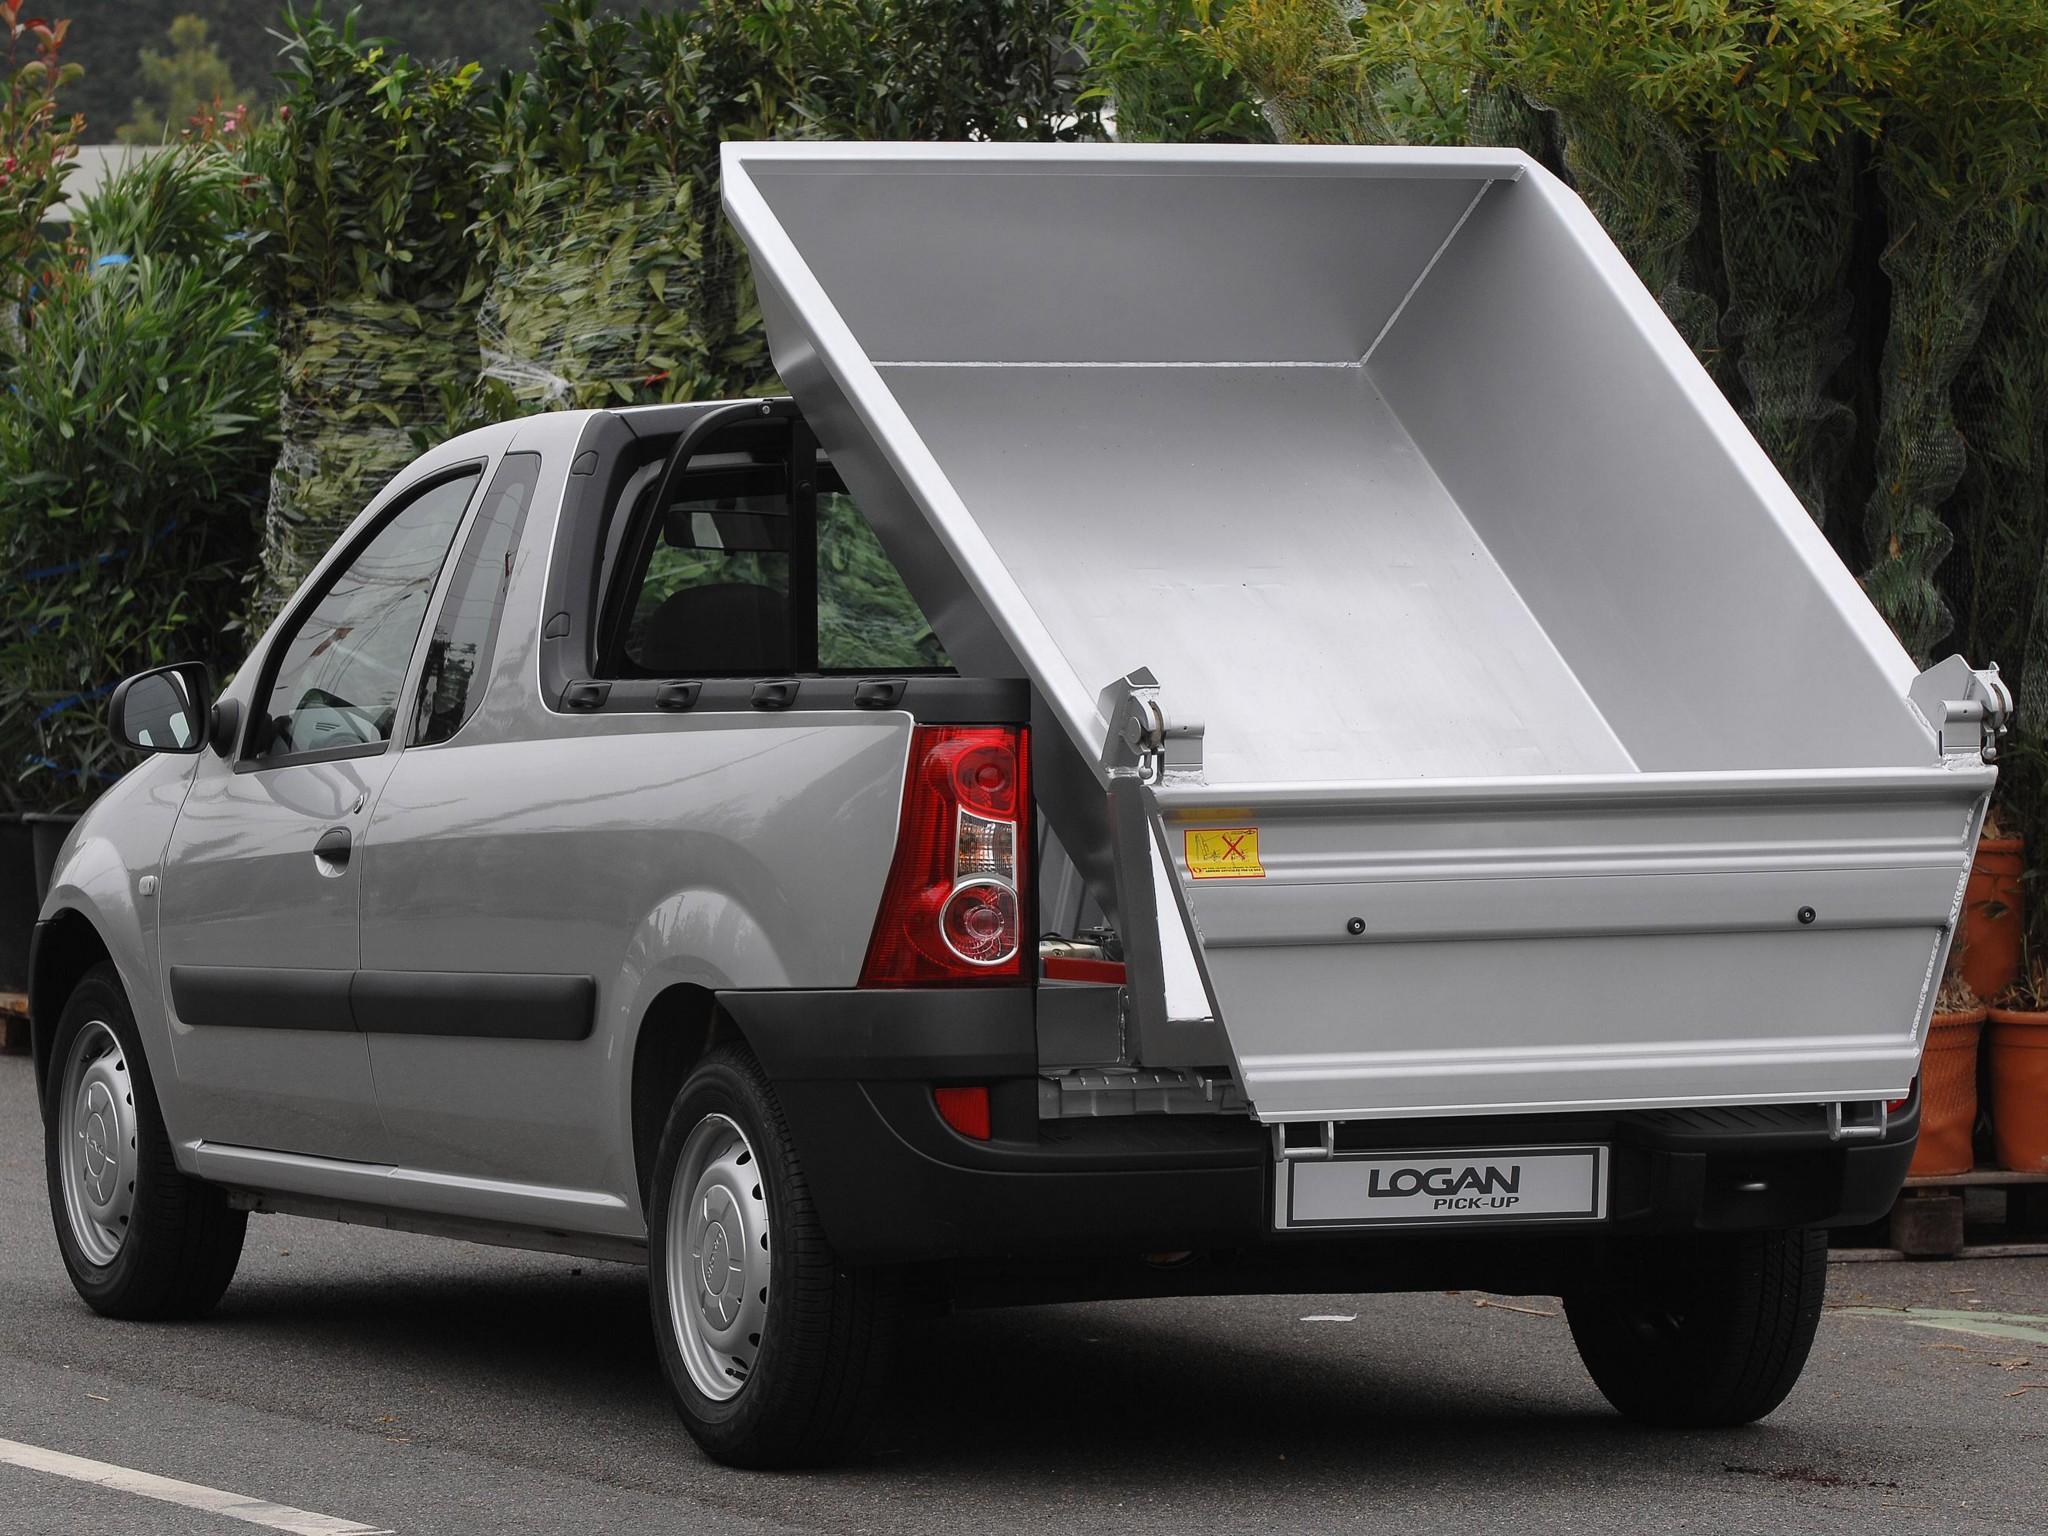 dacia pick up specs 2007 2008 2009 2010 2011 2012 autoevolution. Black Bedroom Furniture Sets. Home Design Ideas